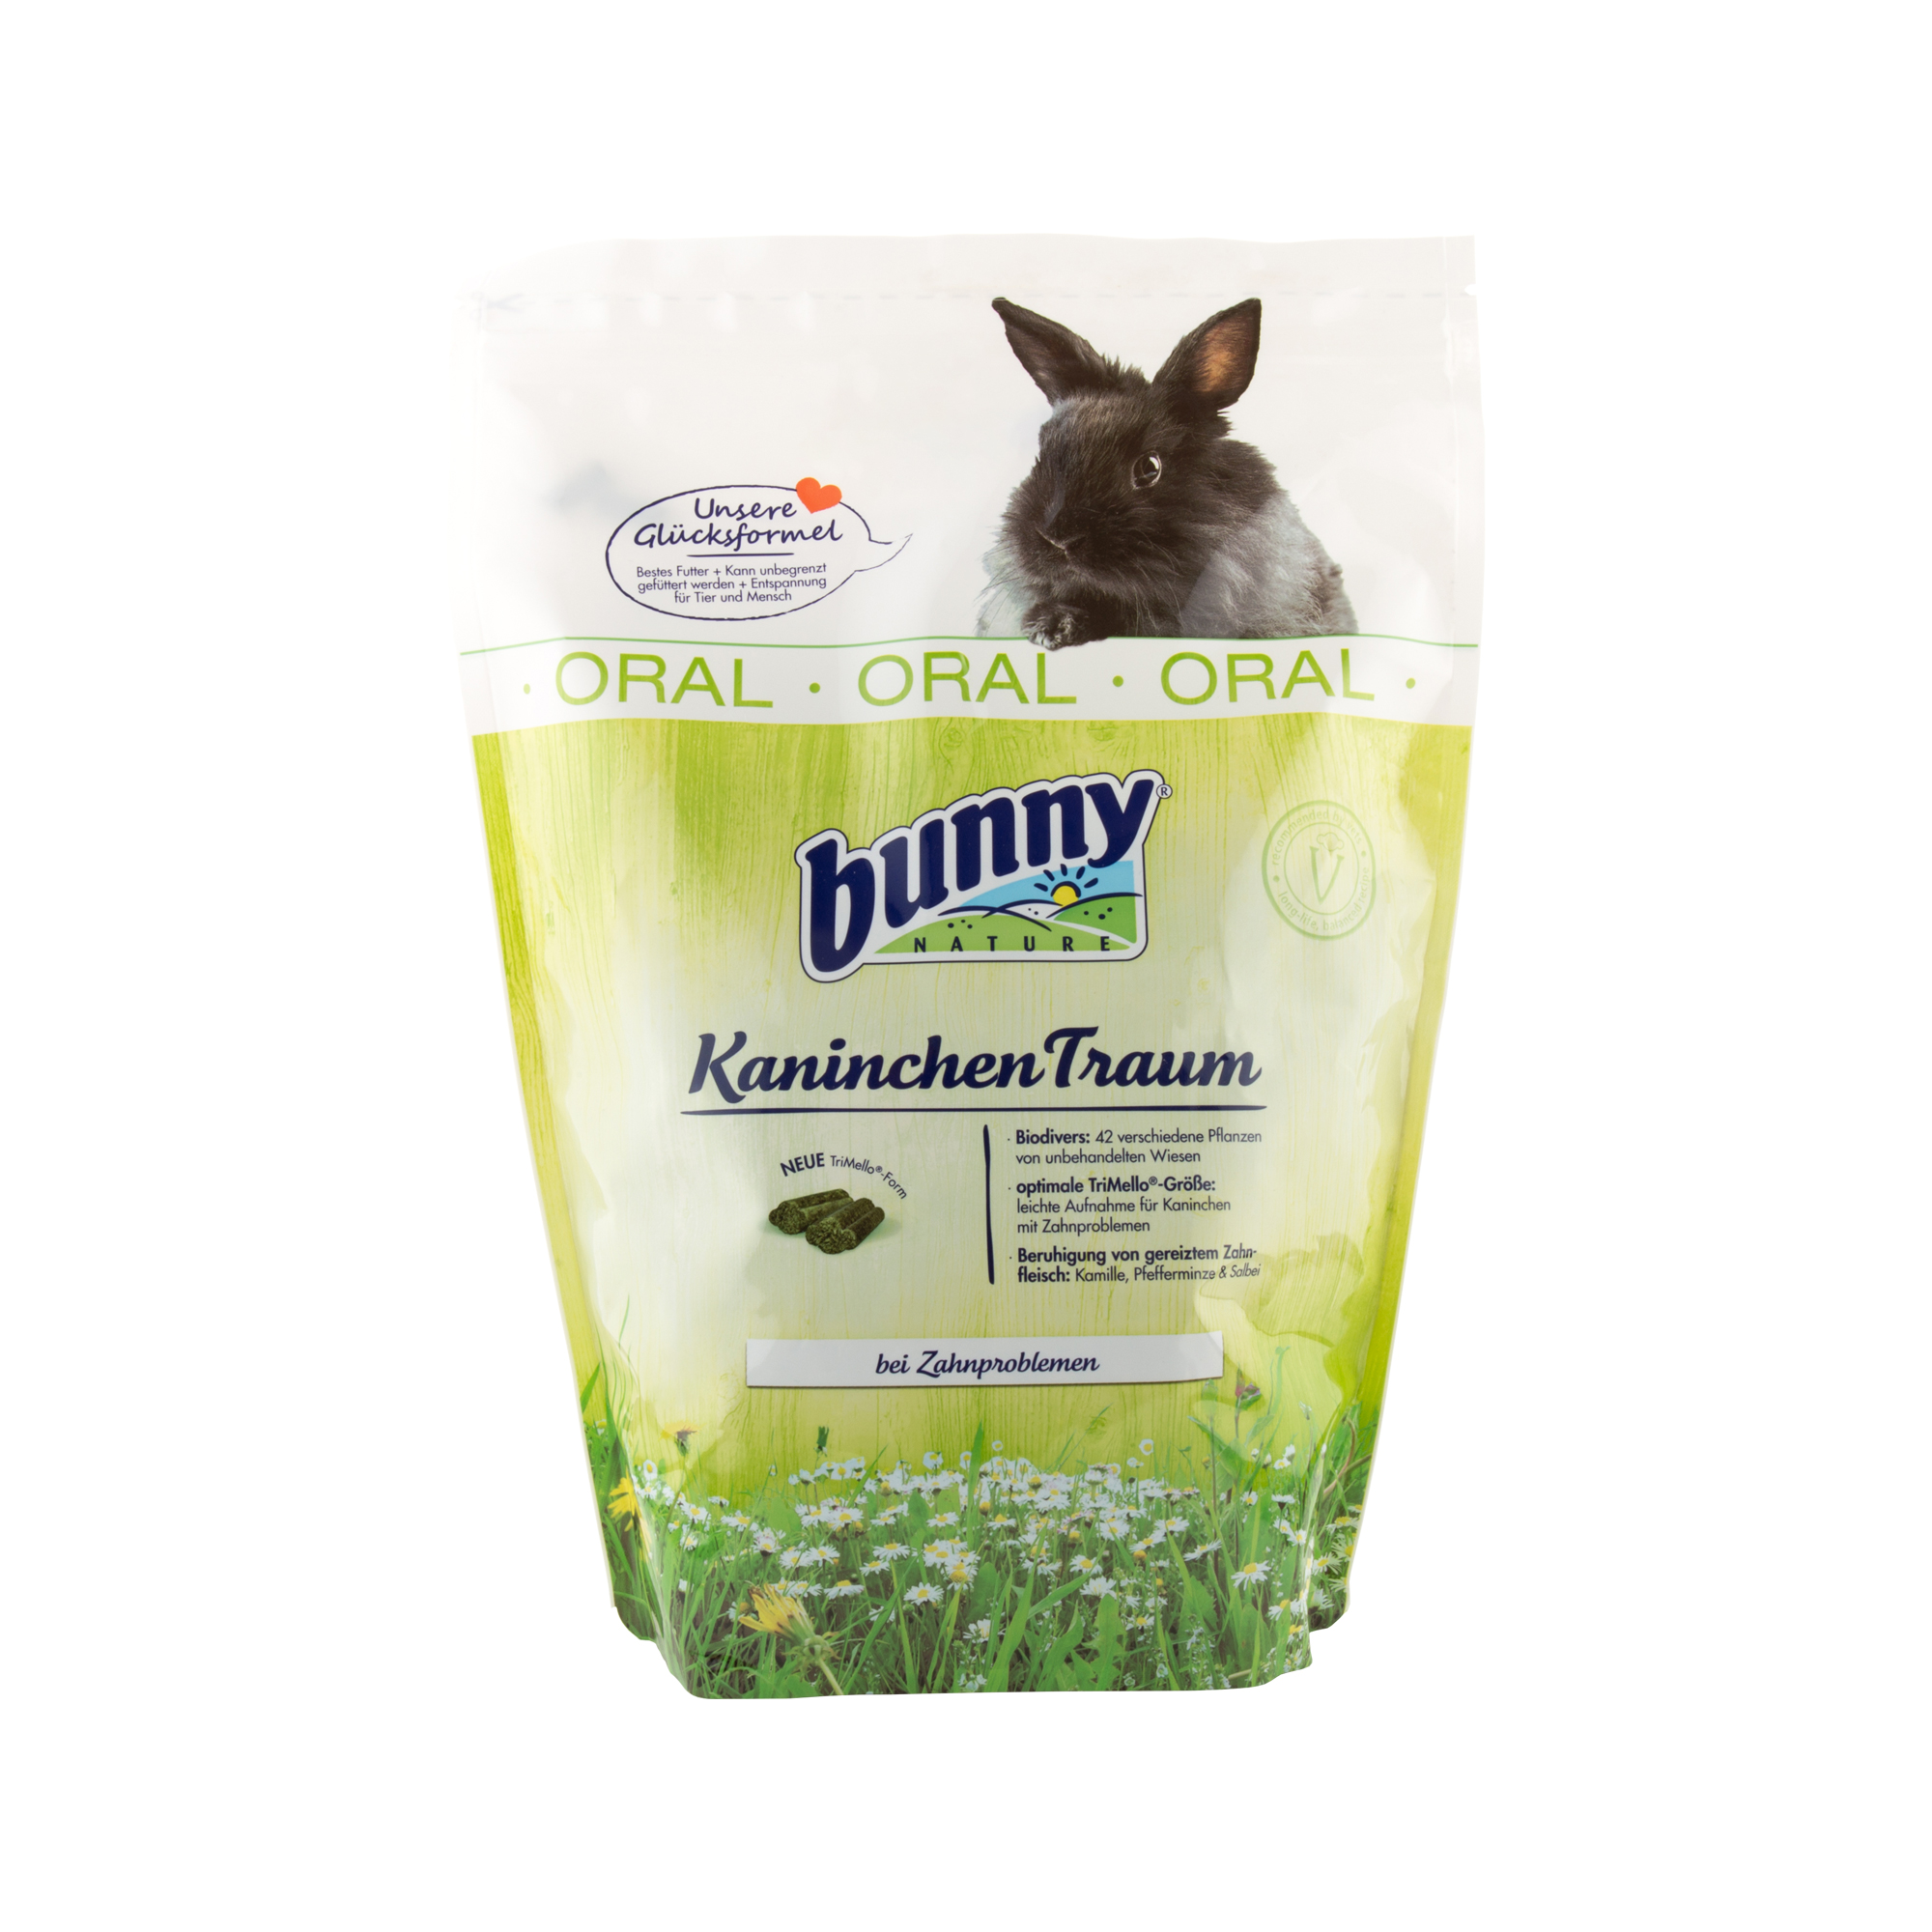 Bunny Nature - Rêve de lapin - Oral - 1,5 kg